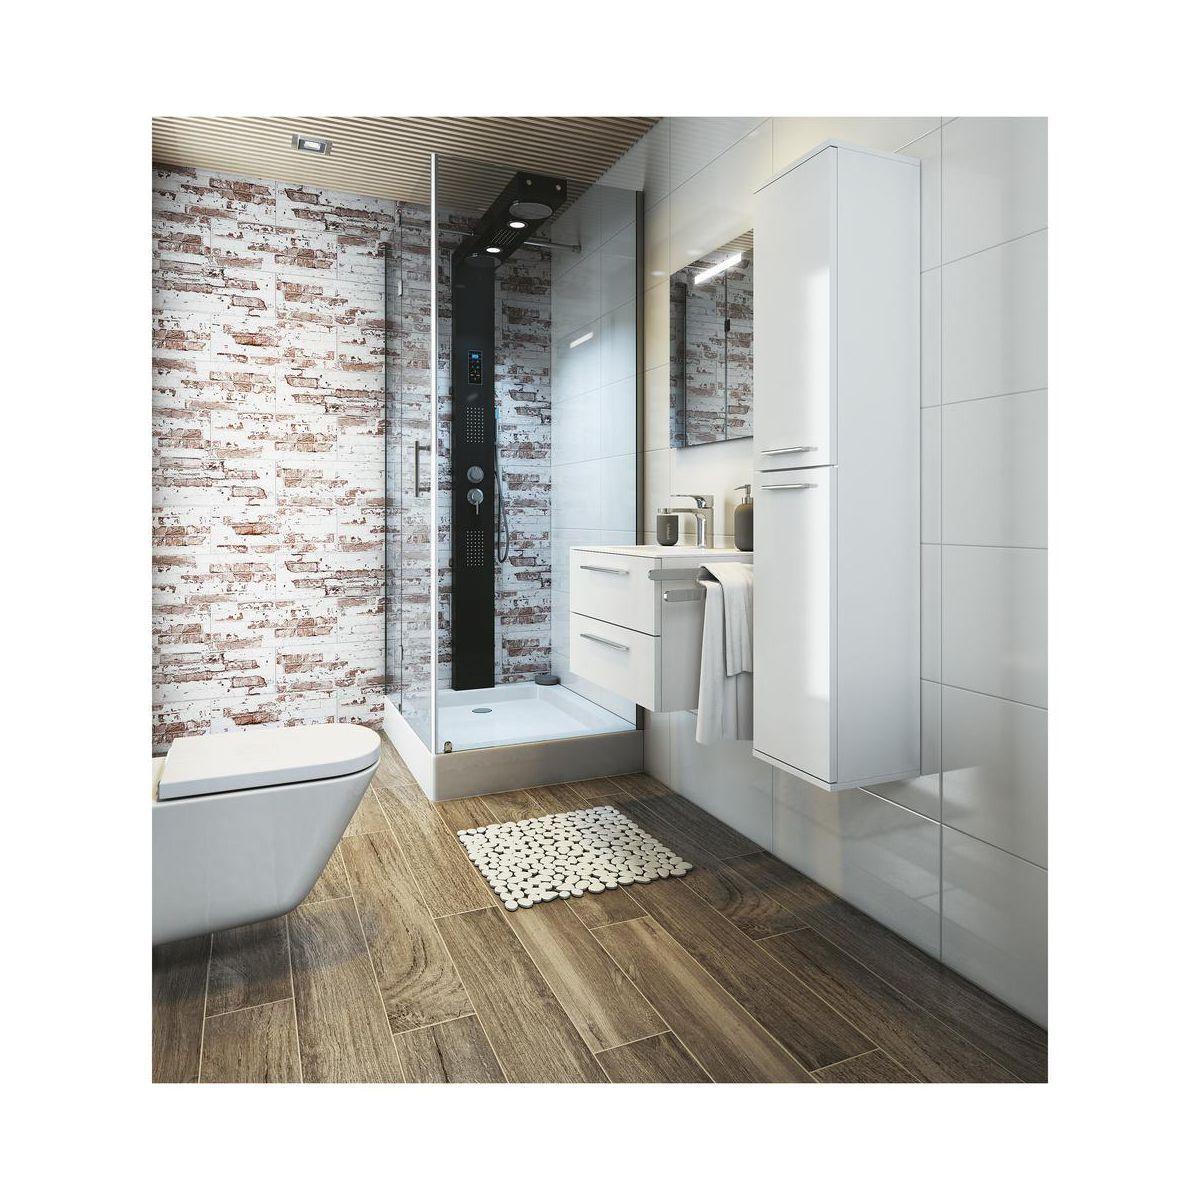 Zestaw Szafka Z Umywalka Sensea Katalonia Bathrooms Remodel Bathroom Inspiration Alcove Bathtub